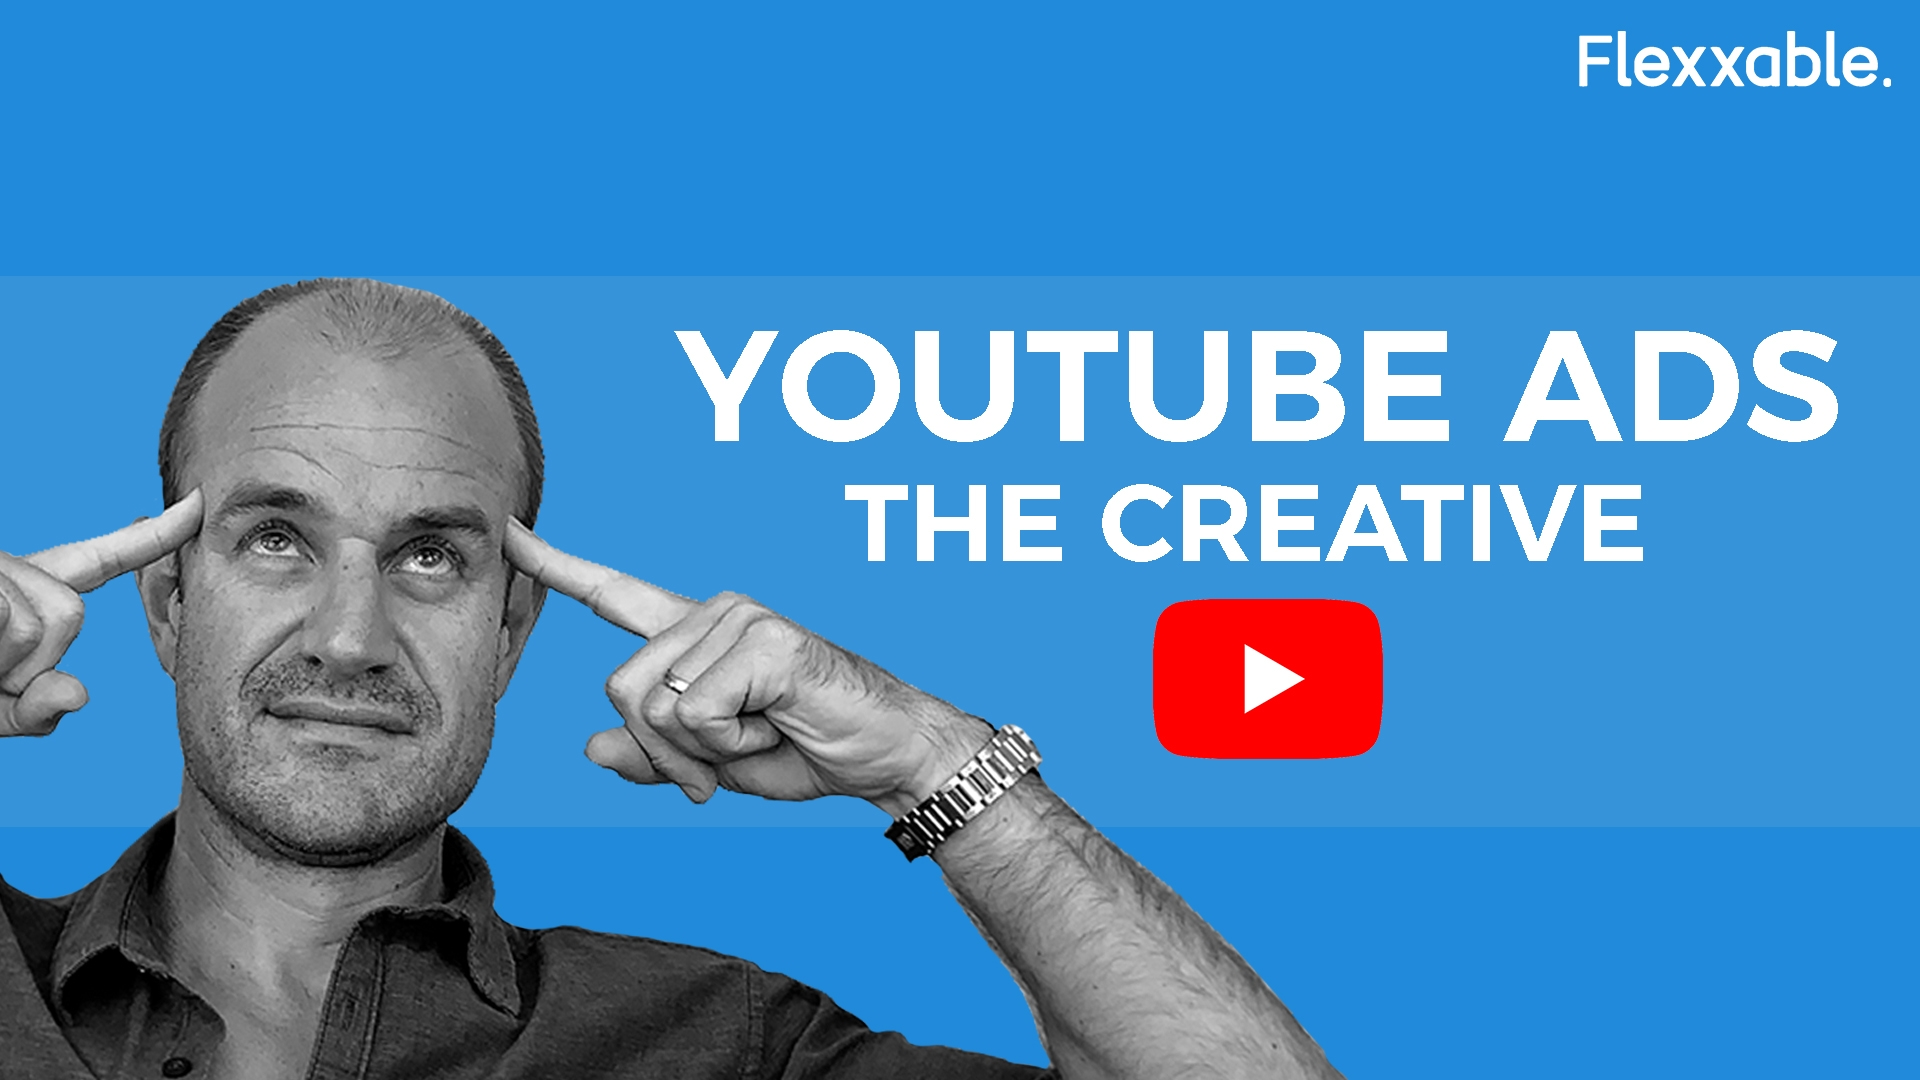 YT ads the creative